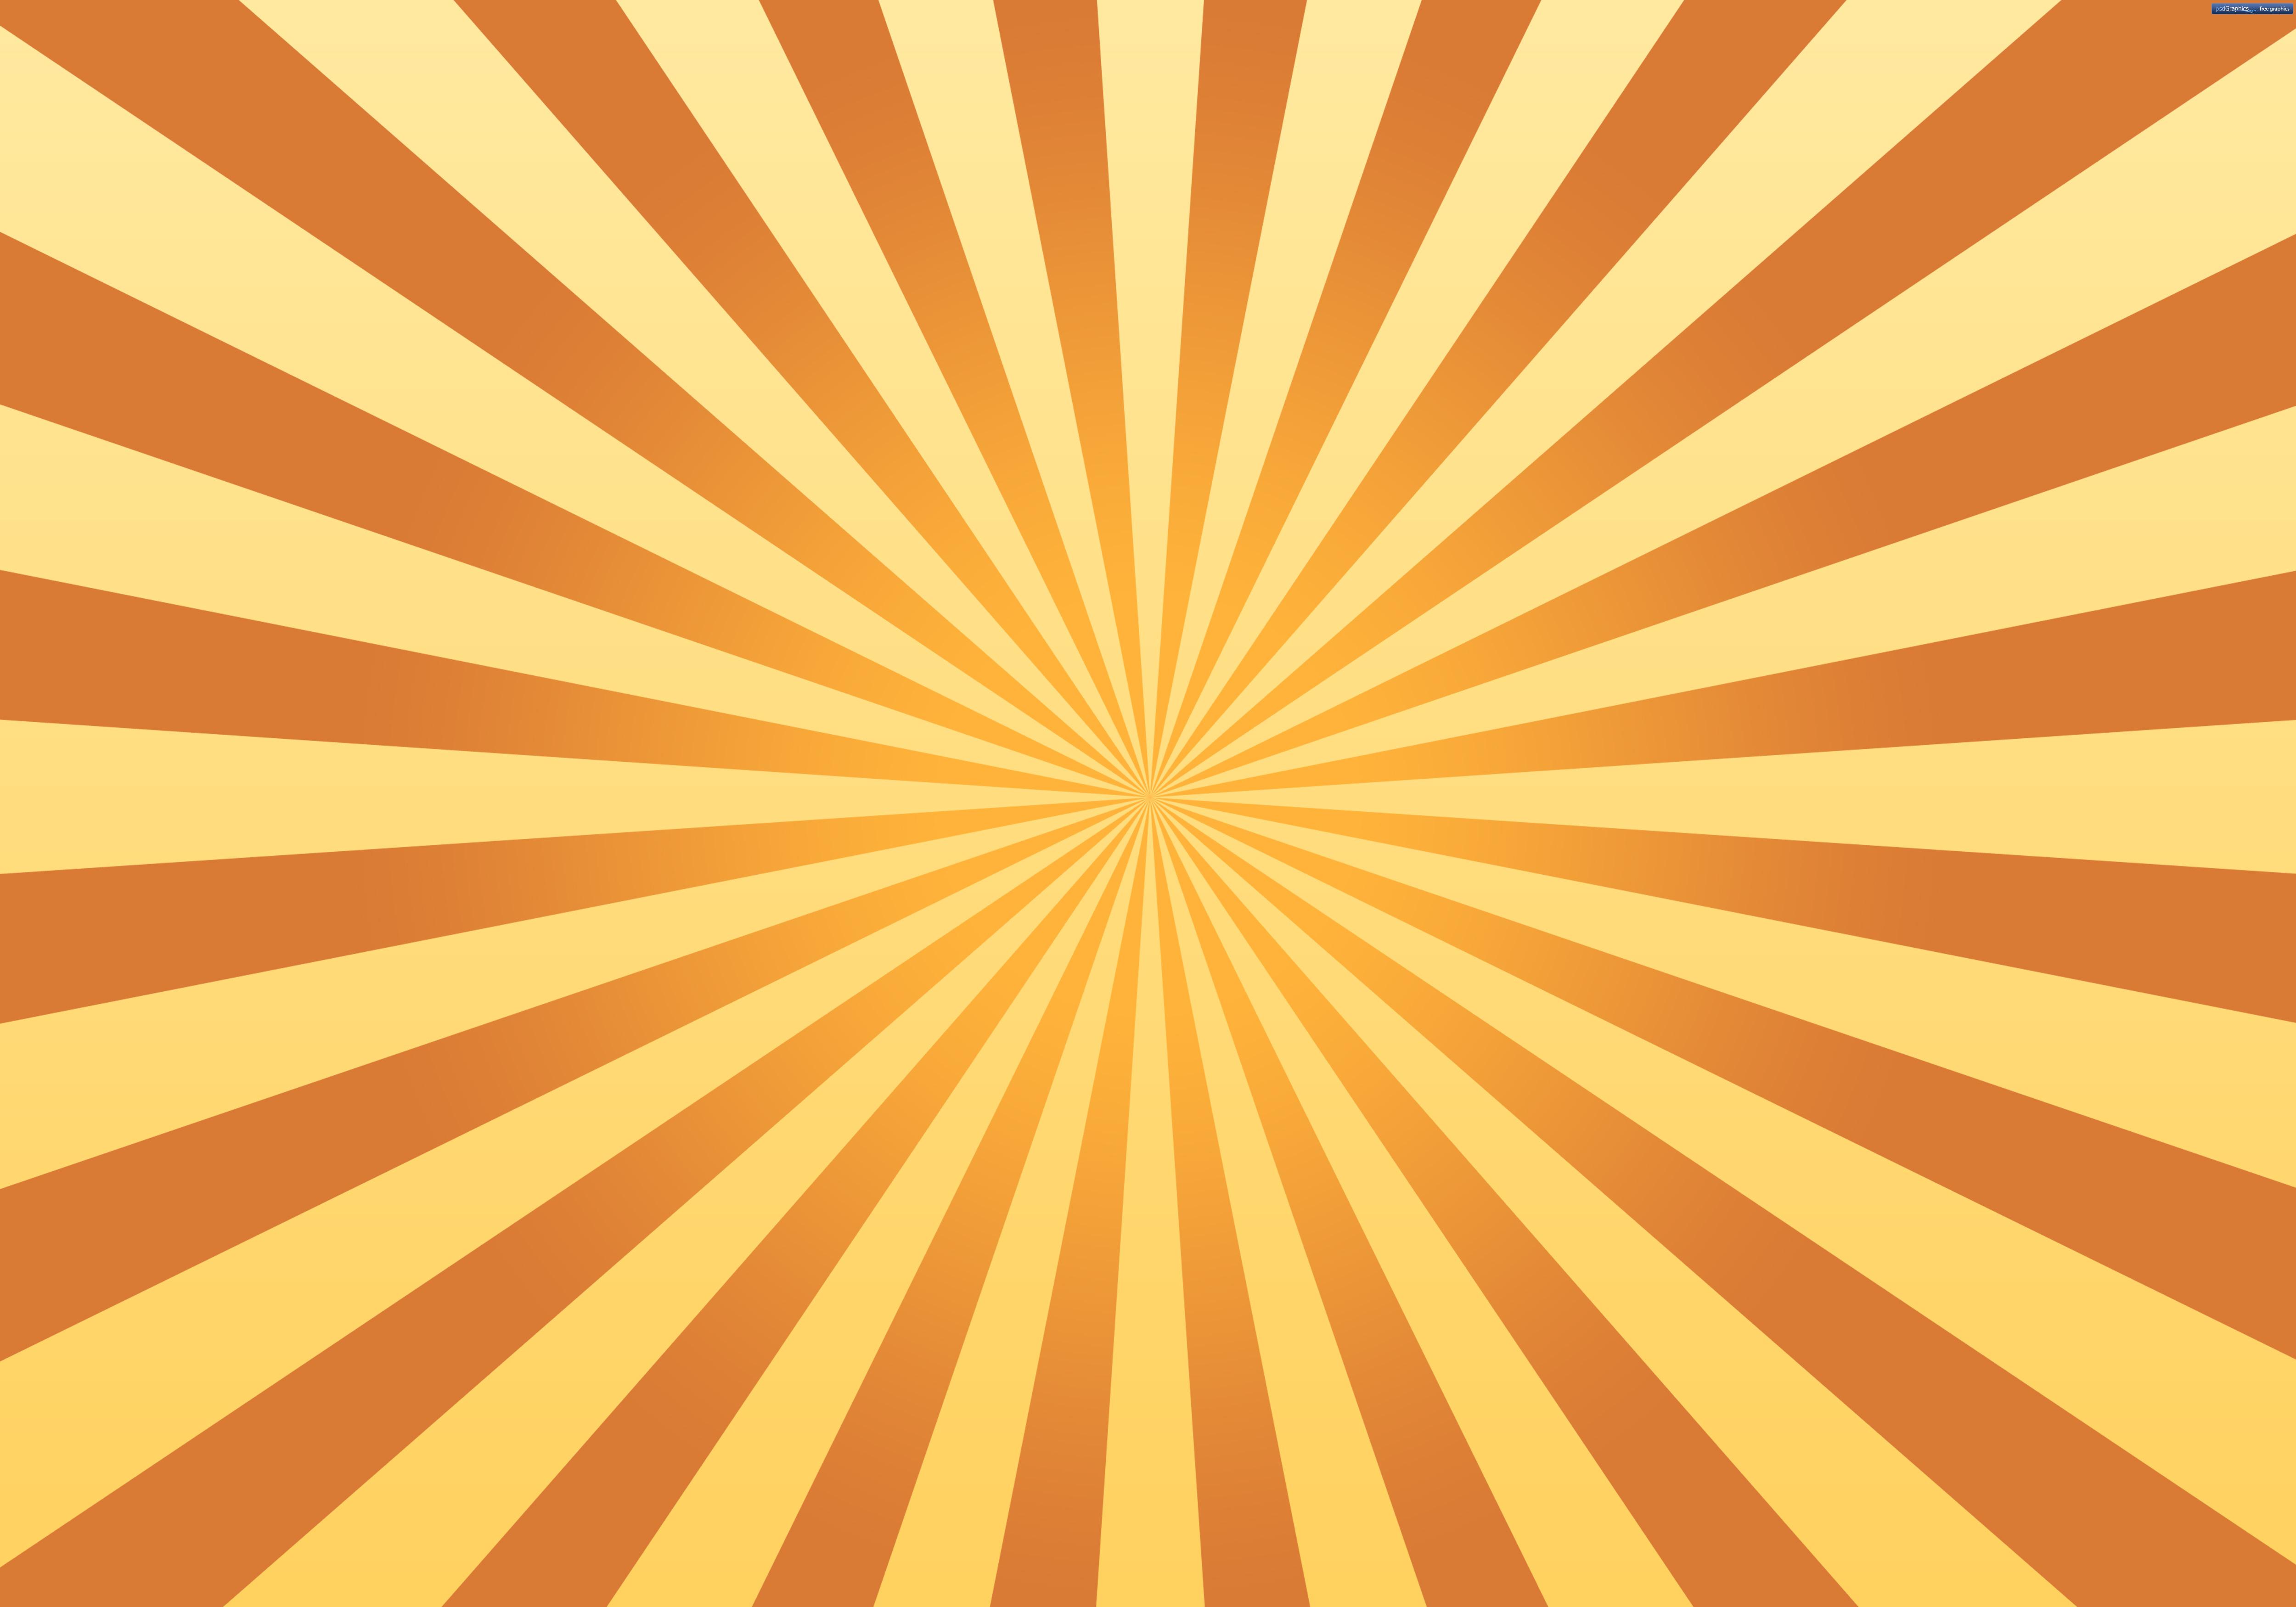 Retro Wallpaper Sunlight Hd Desktop Wallpapers 4k Hd